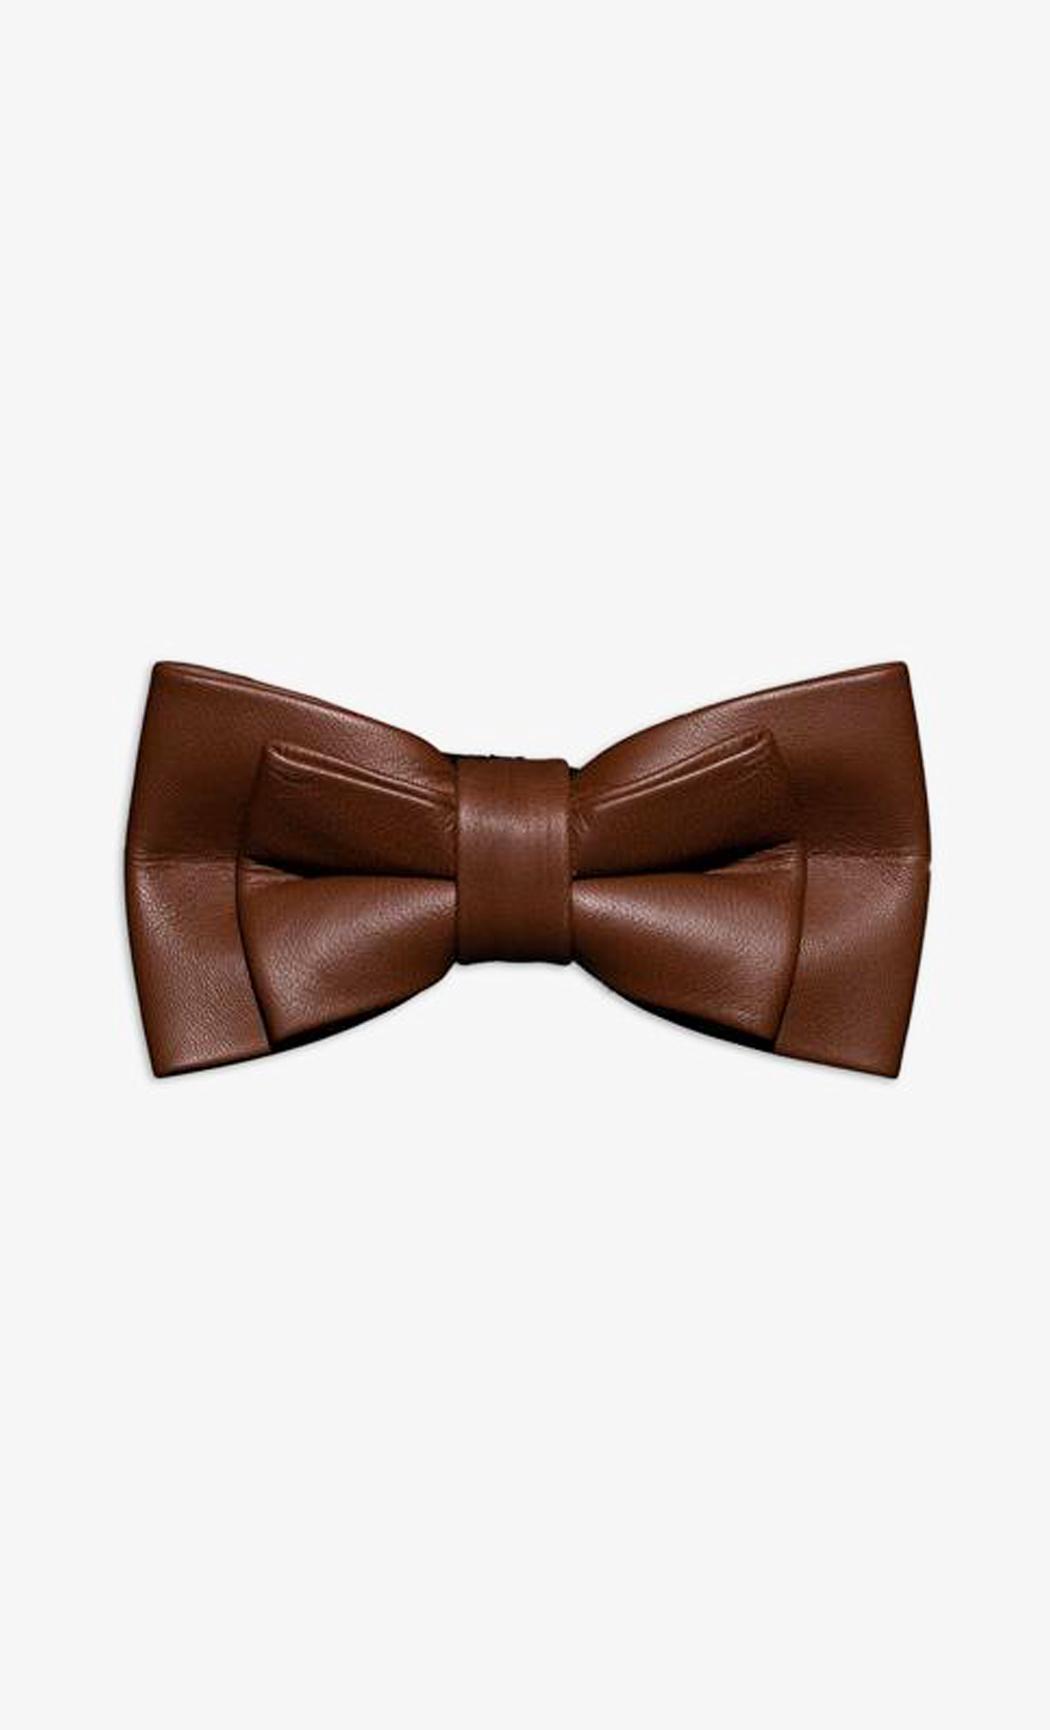 Dark Brown Genuine Leather Twin Narrow Bow Tie. Buy Online